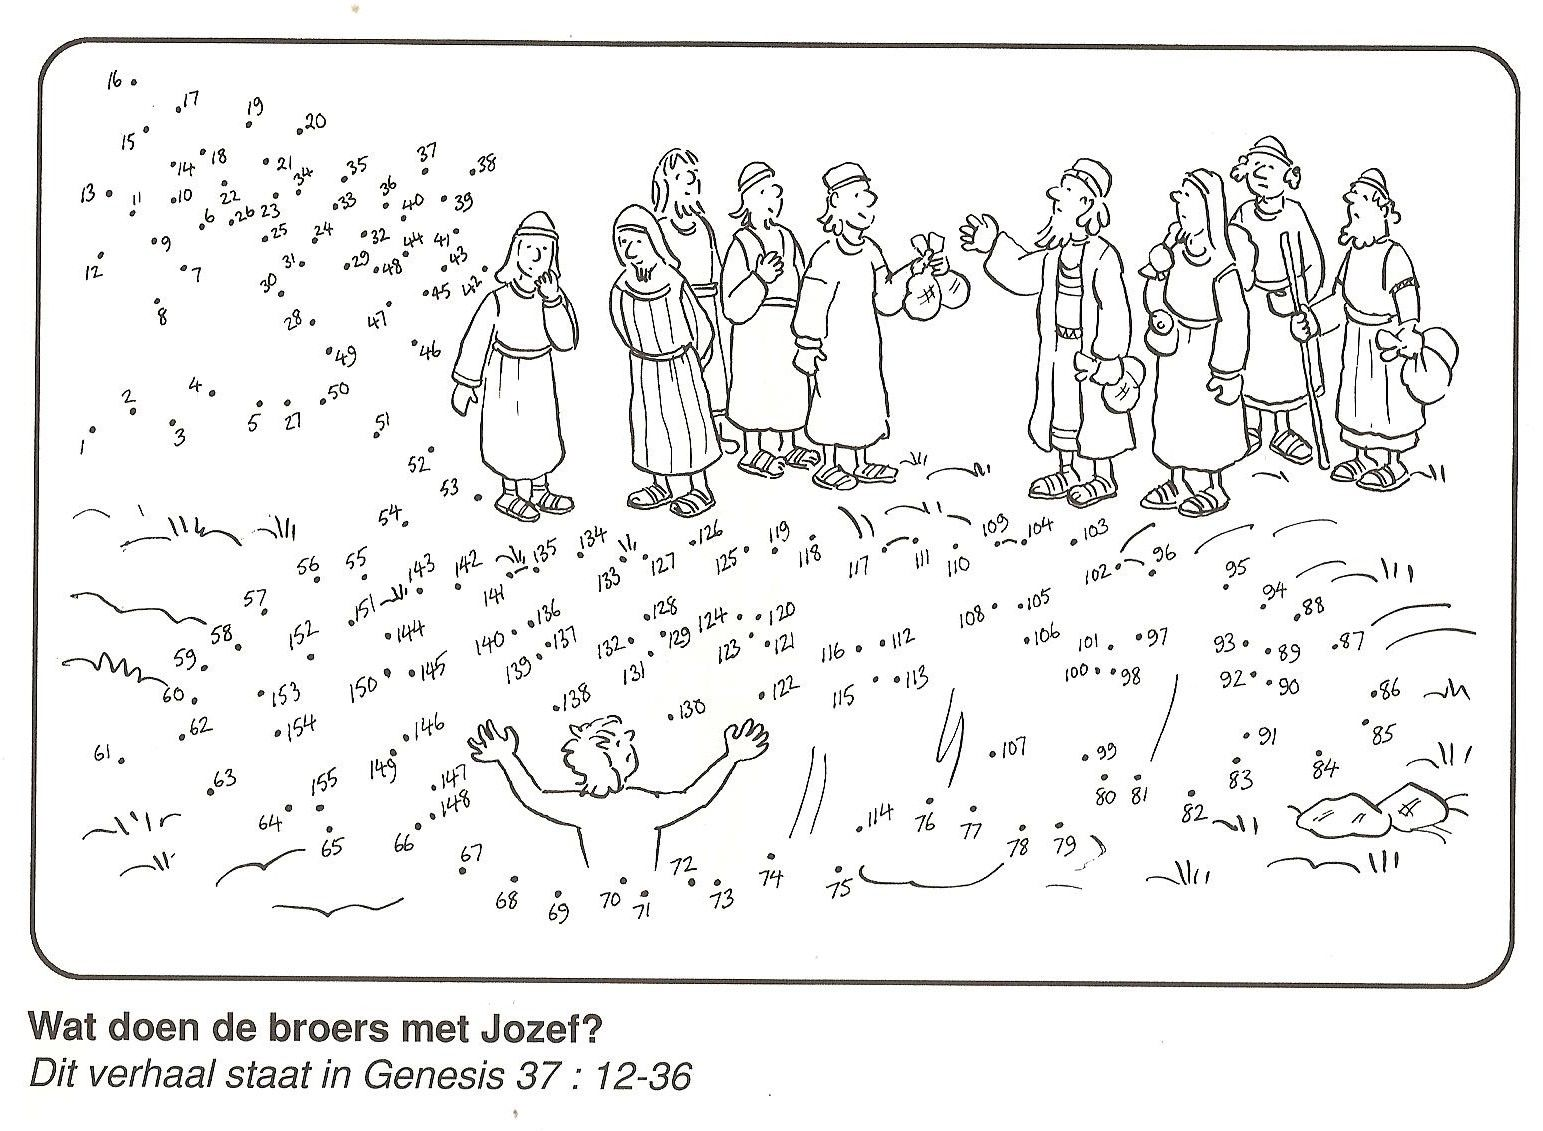 Joseph Thrown Into The Pit Genesis 37 Dot To Dot Printable Sunday School Bible School Crafts Bible Activities Bible Crafts